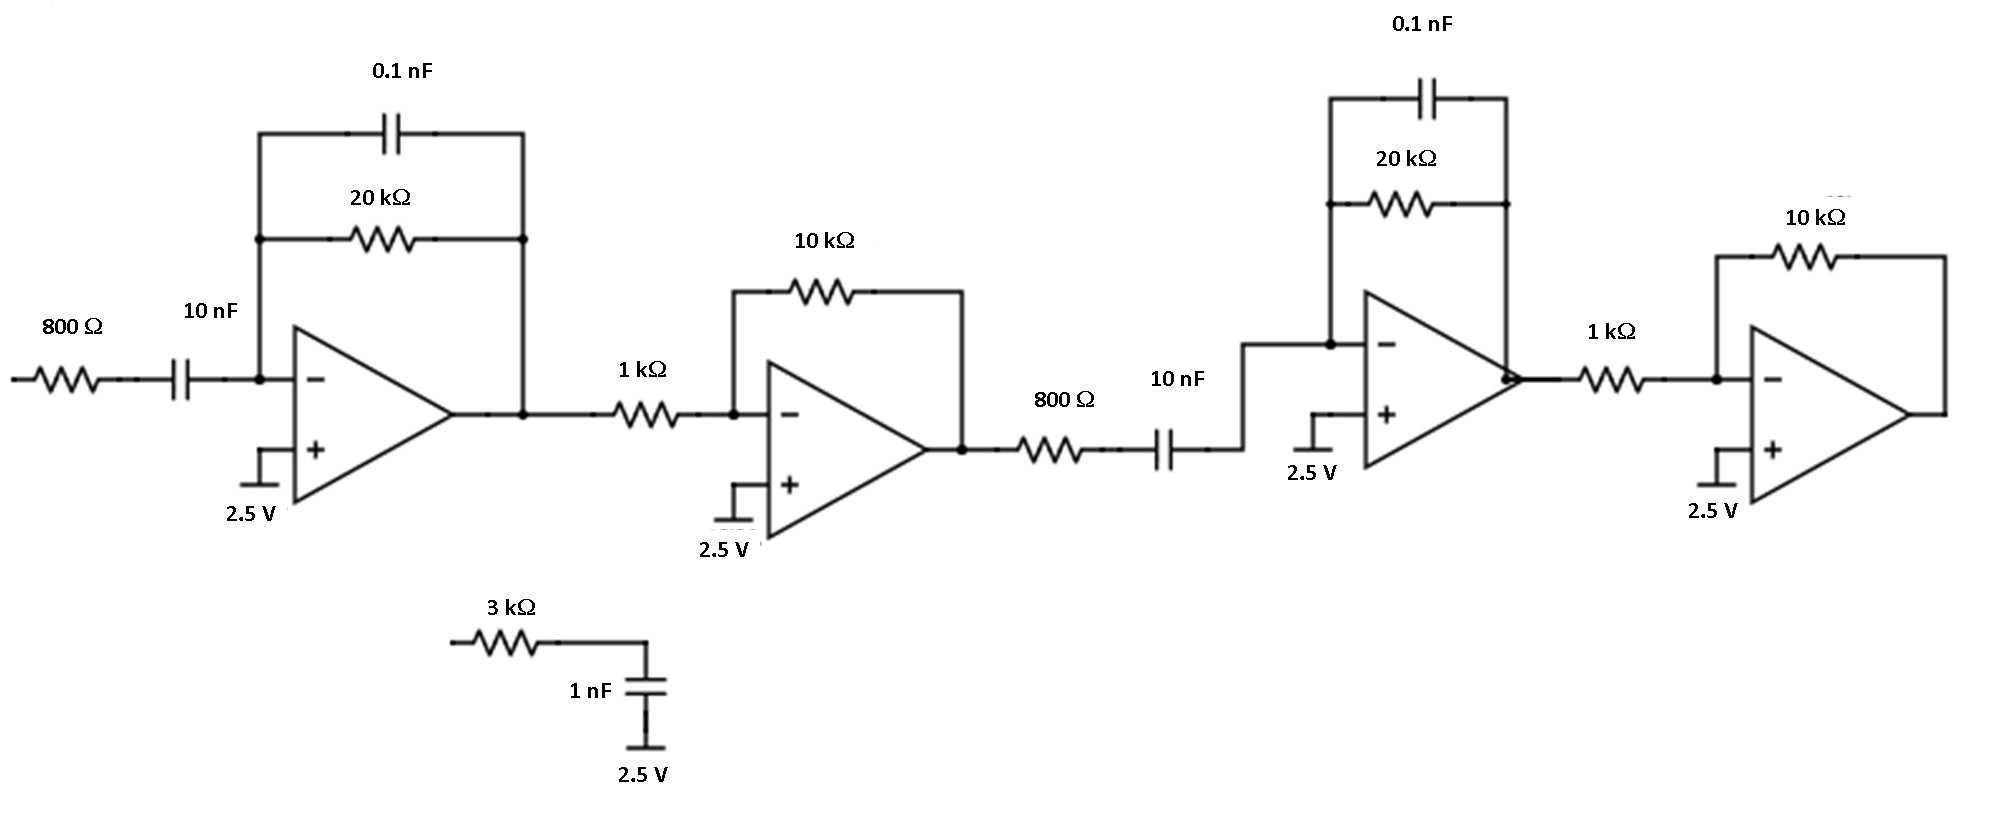 module 9 rh ece utep edu ultrasonic sensor schematic diagram ultrasonic sensor circuit